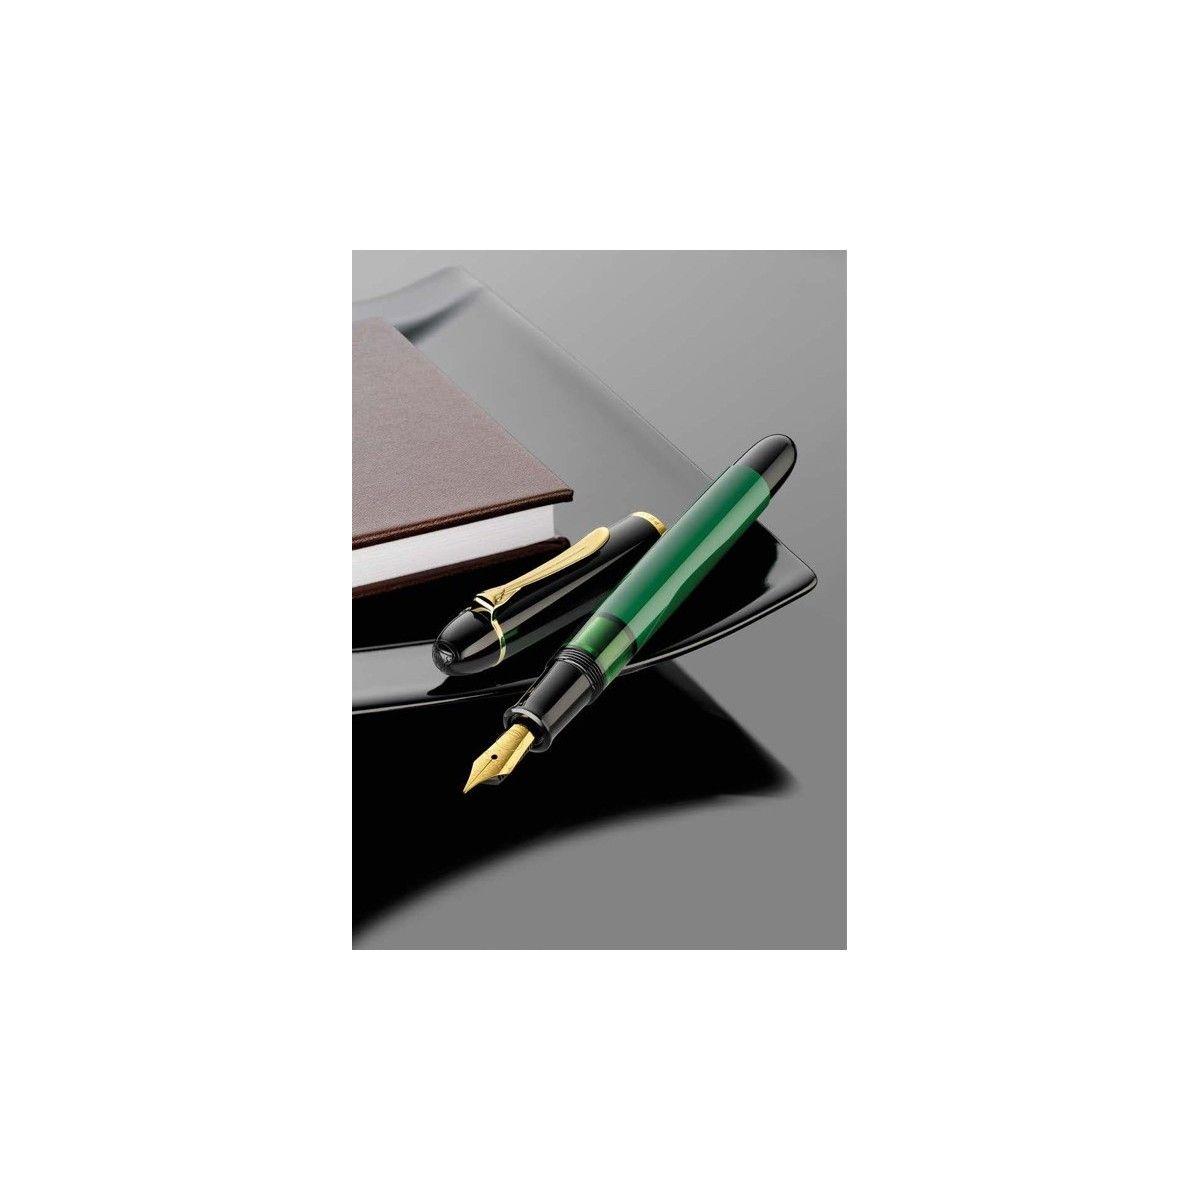 SPECIAL EDITION M120 verde/nera